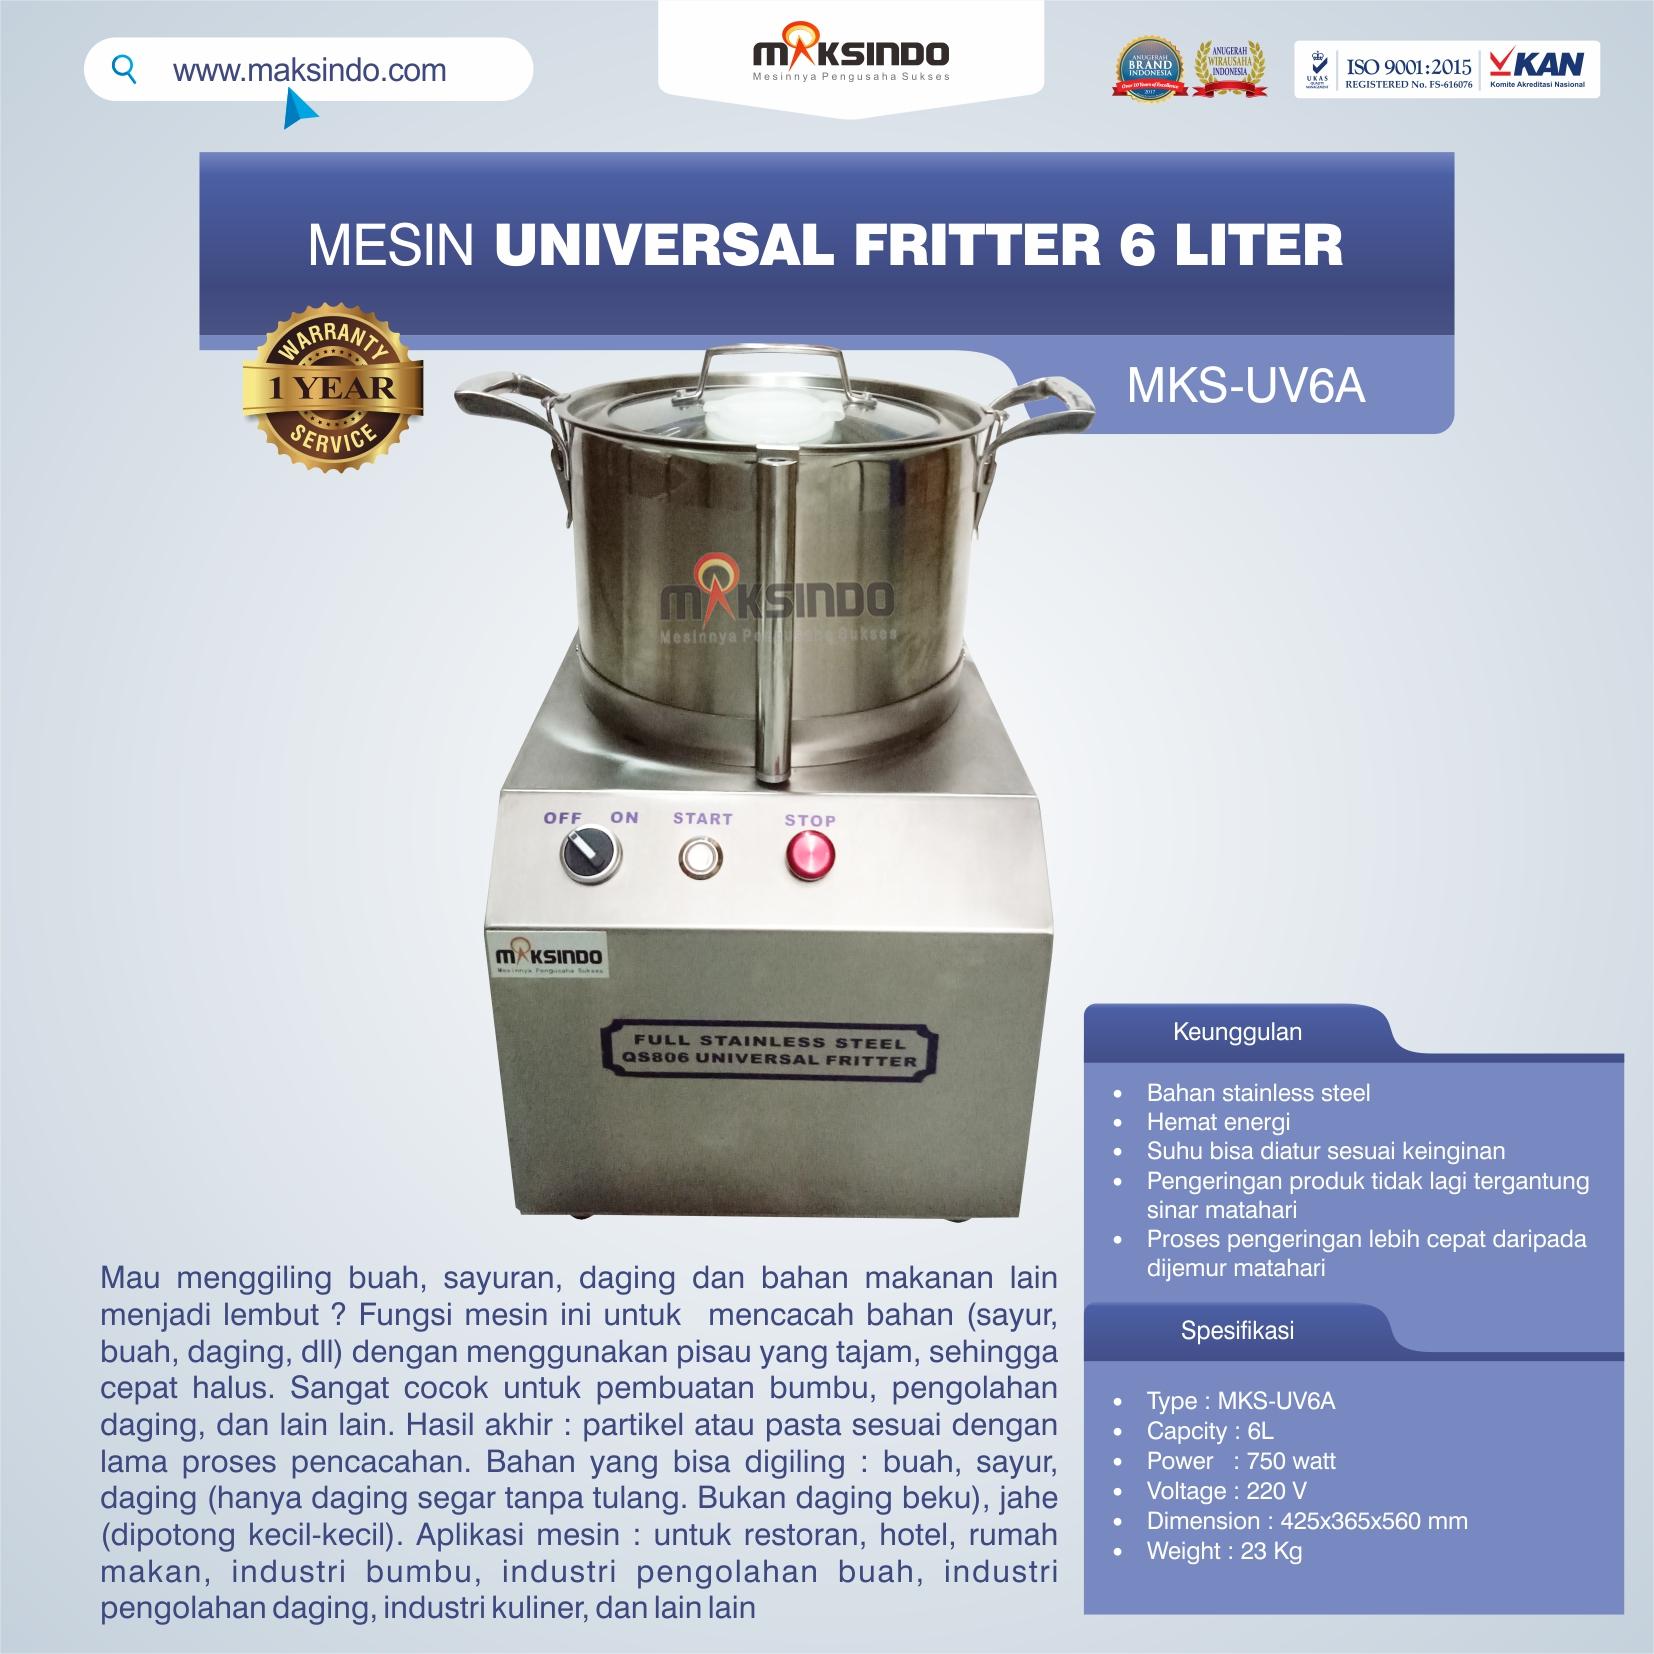 Jual Universal Fritter 6 Liter (MKS-UV6A) di Bali